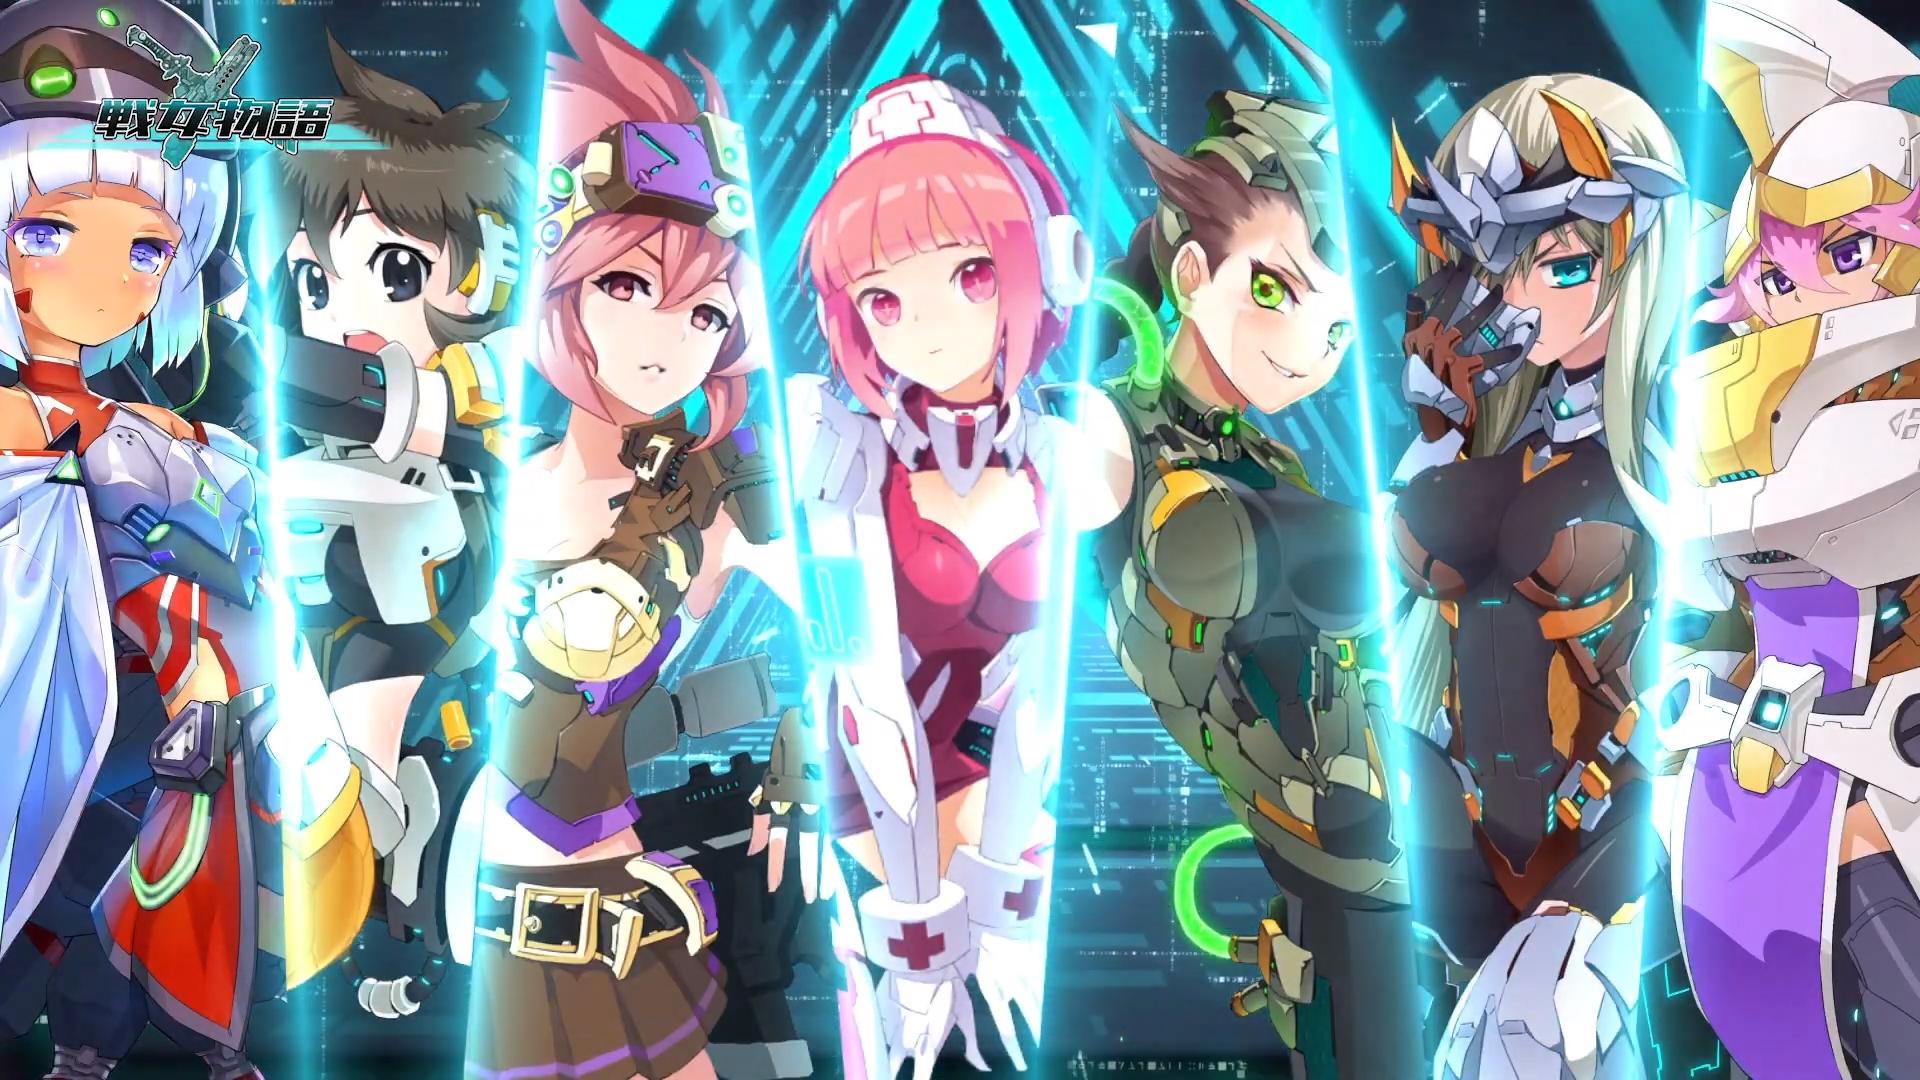 Valkyrie Heroes Saga 2222020 2